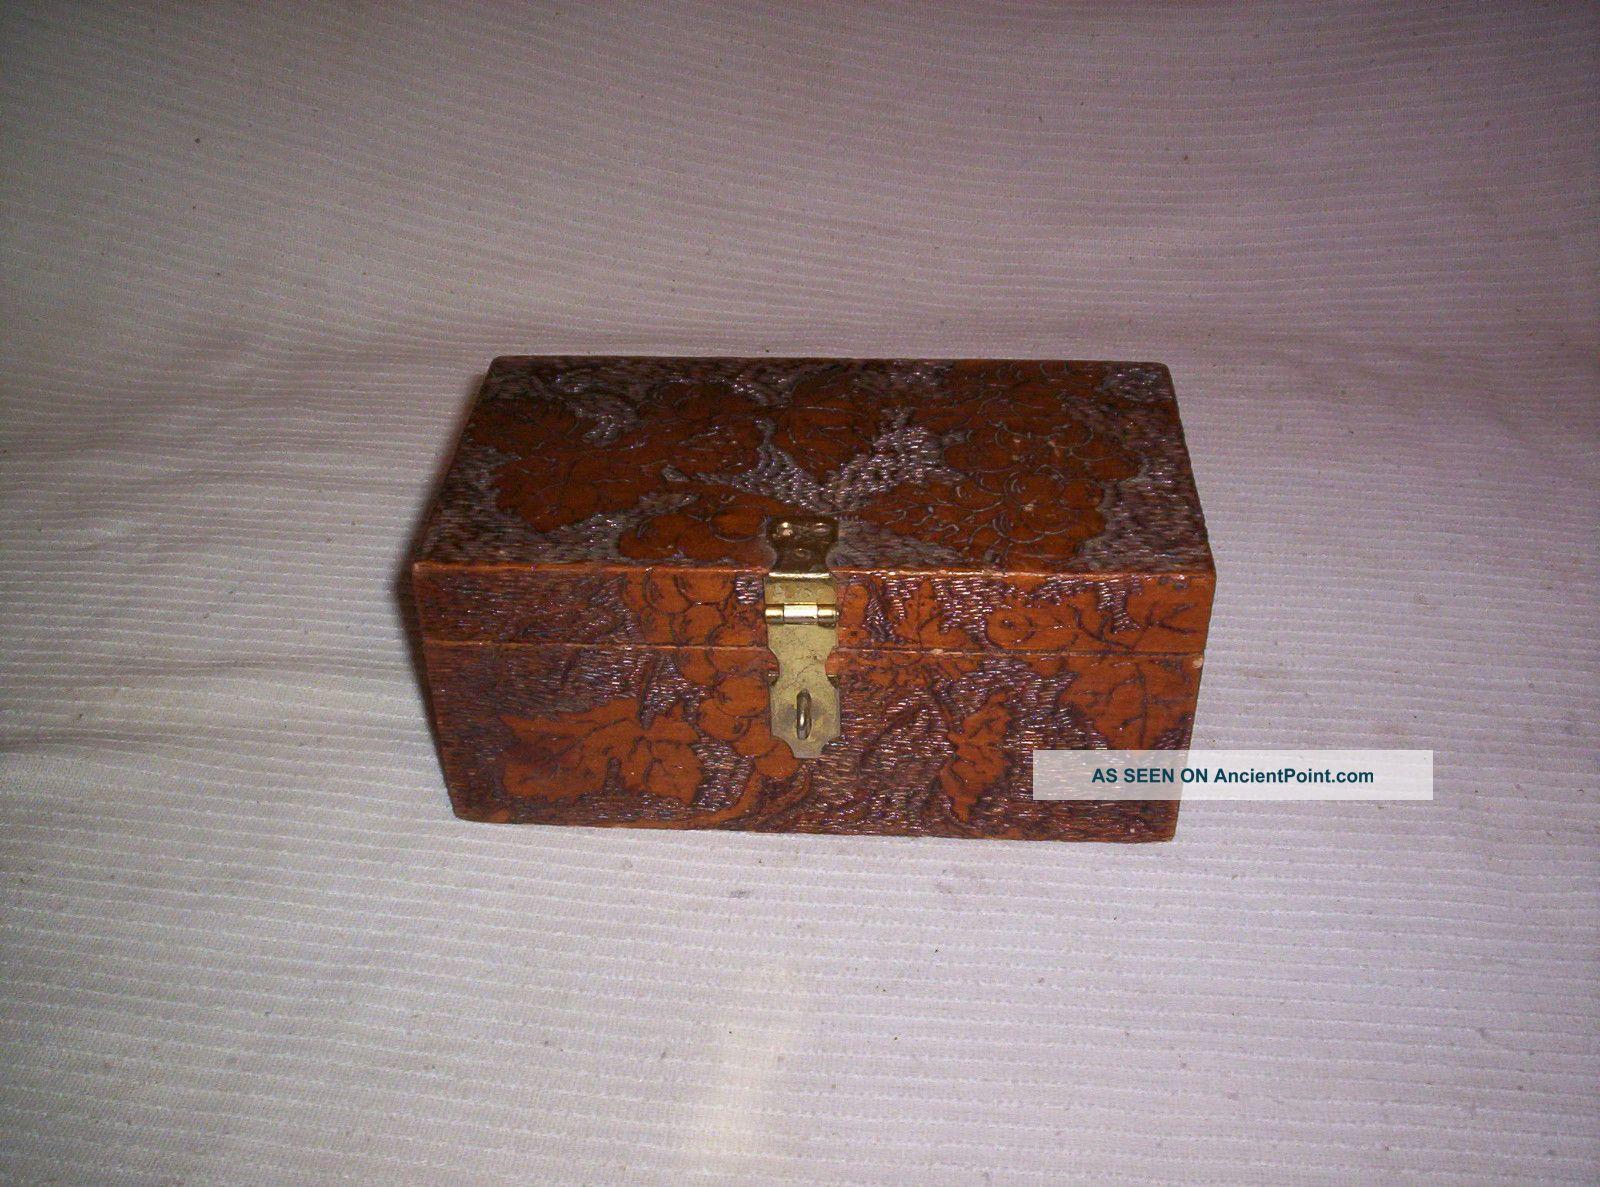 1908 Hand Carved Wood Box Jewelry Keepsake Wood Carving Grape Leaf Design Boxes photo